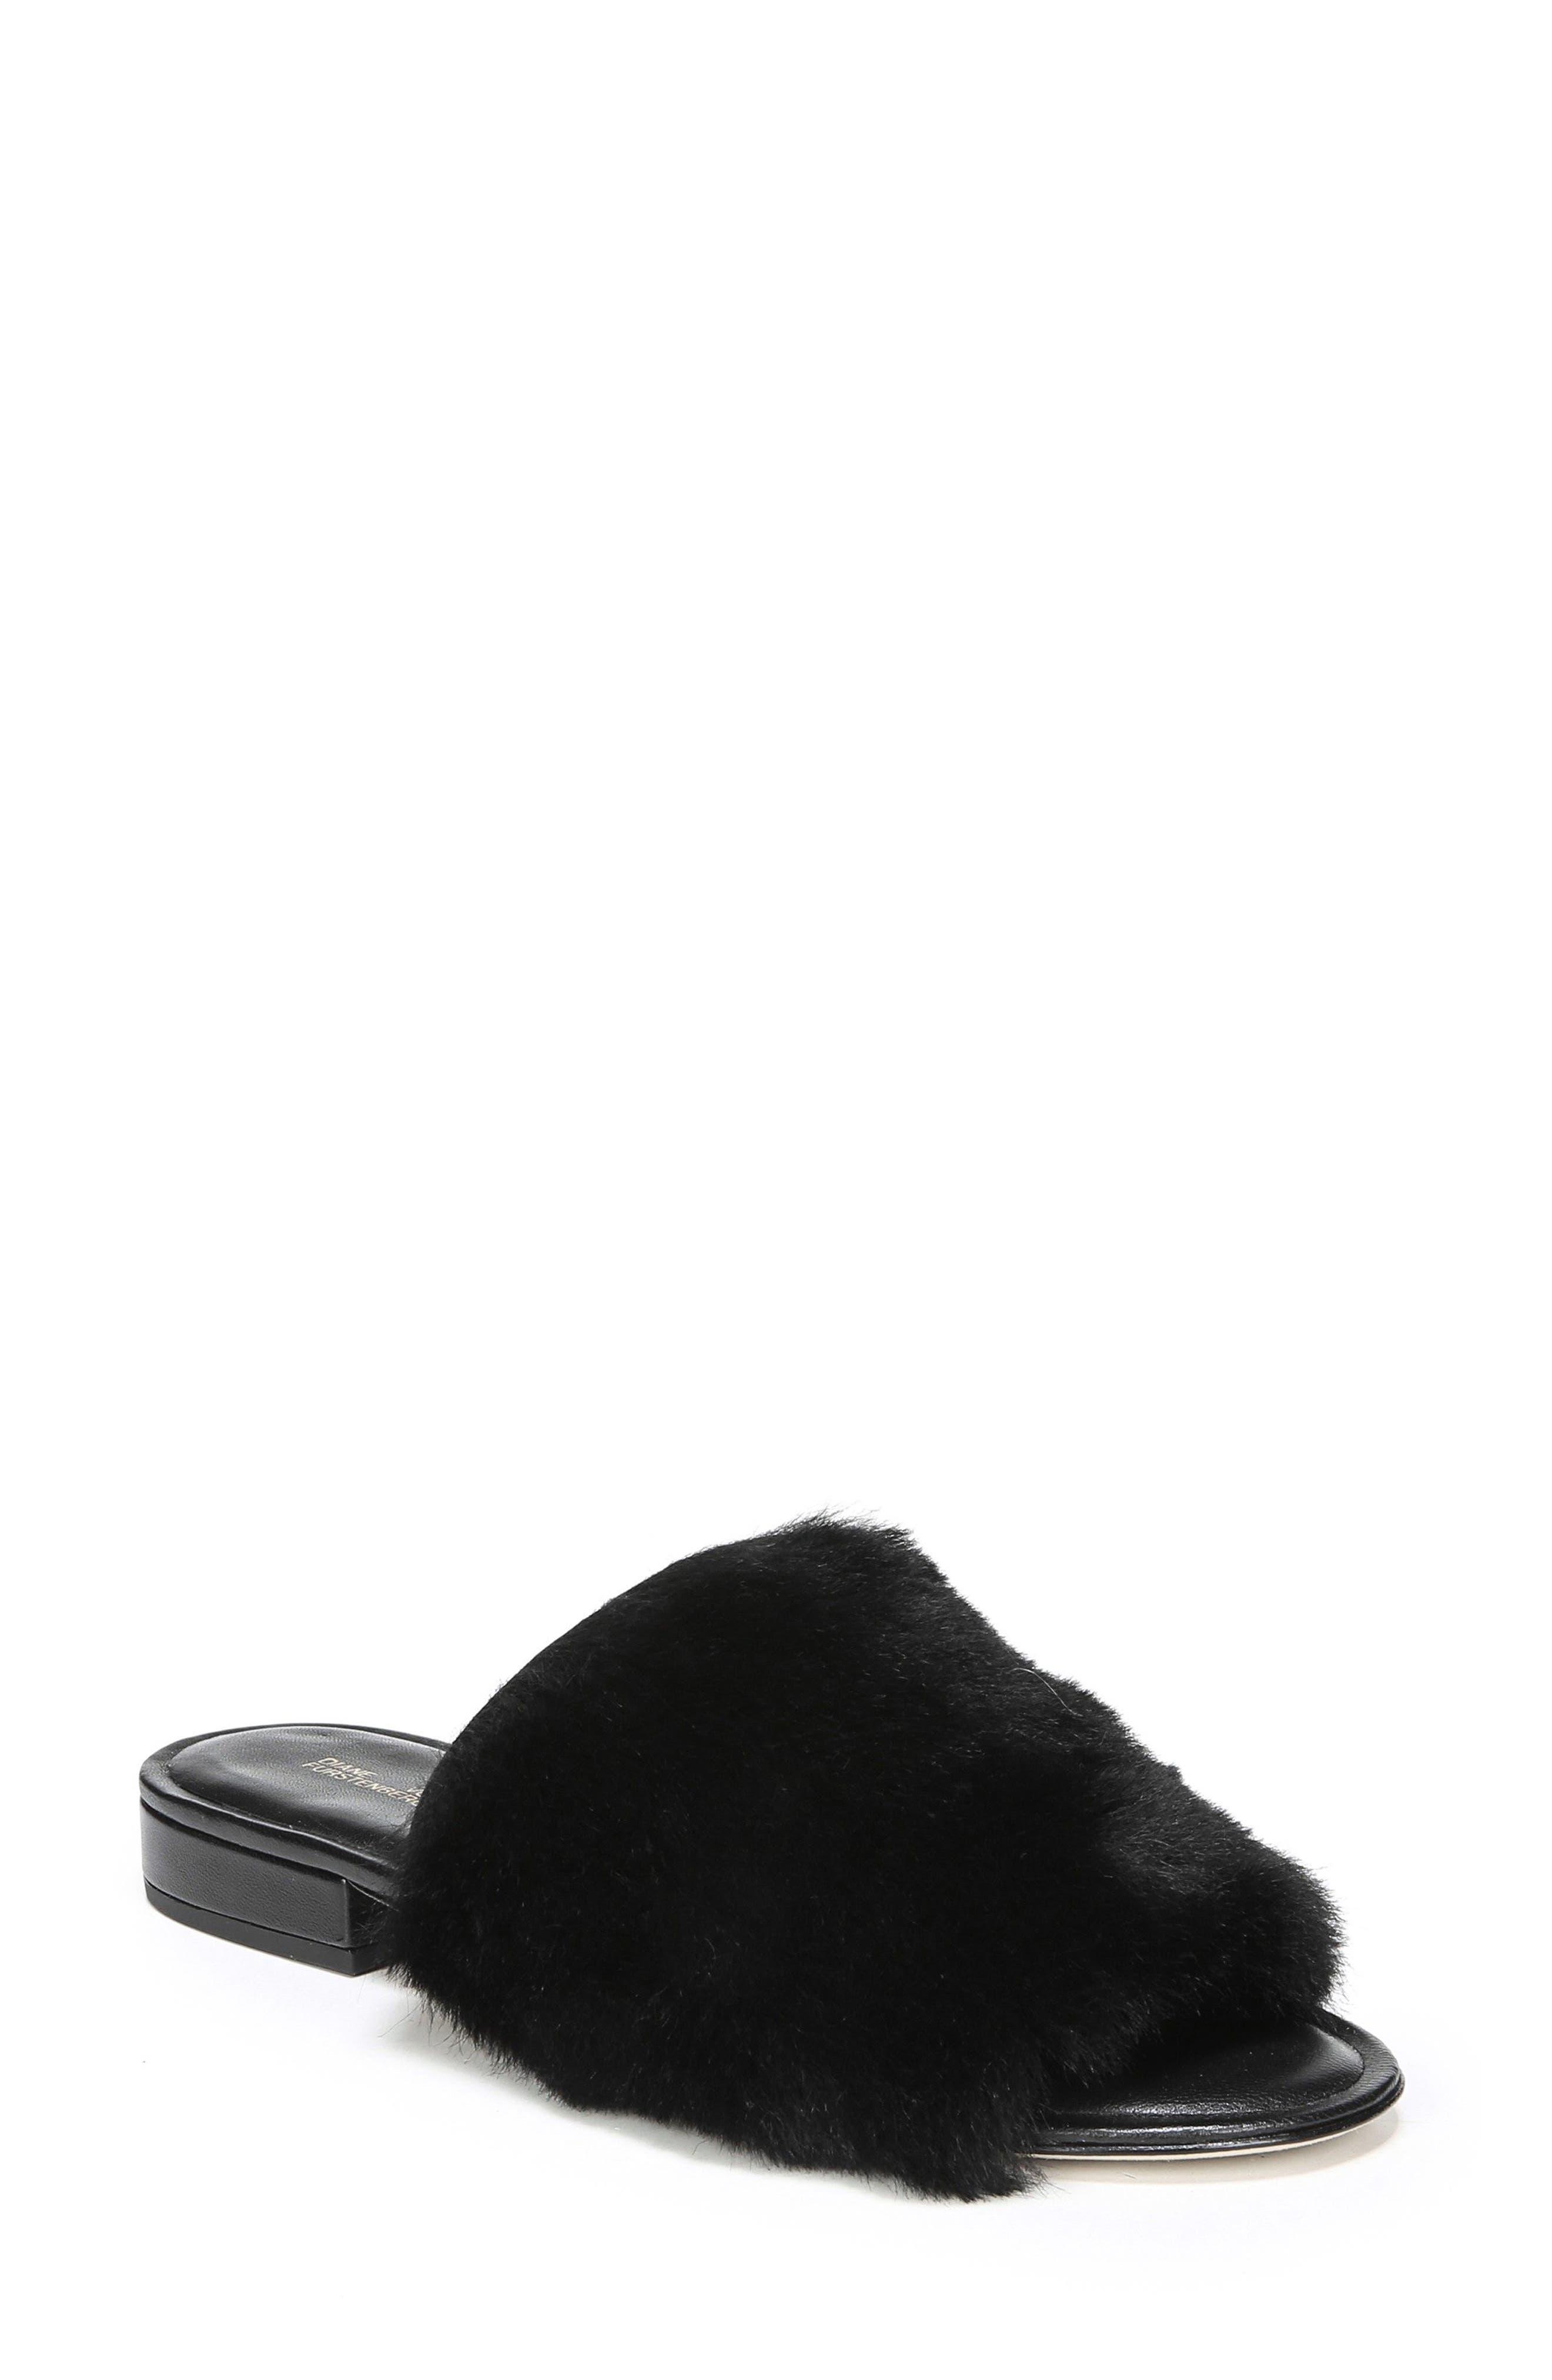 Alternate Image 1 Selected - Diane von Furstenberg Santi Genuine Shearling Slide Sandal (Women)